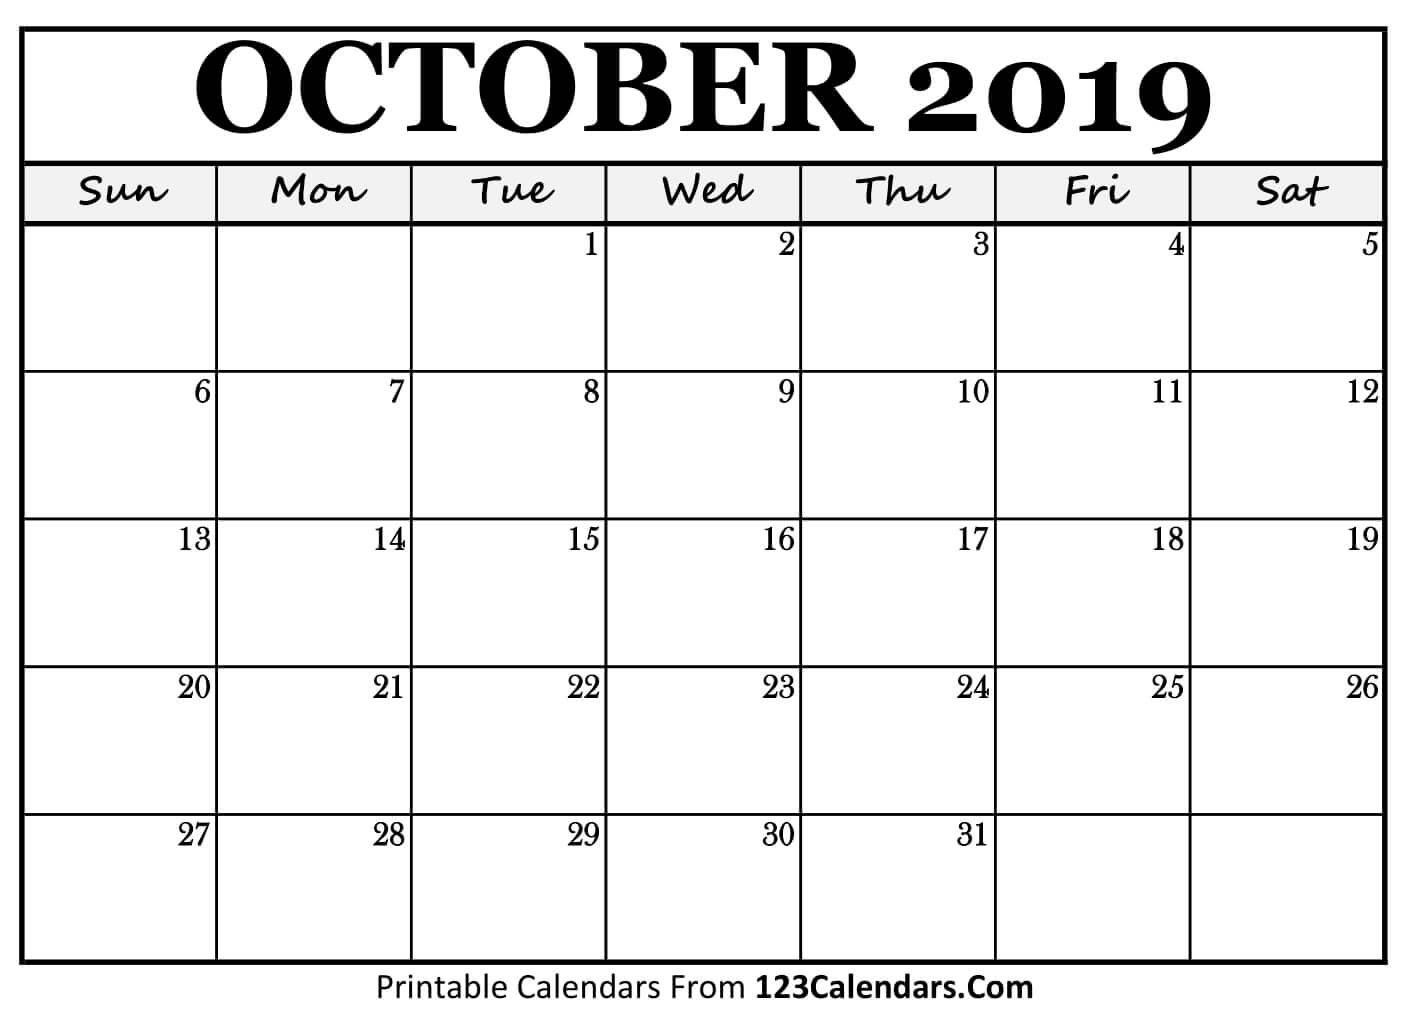 Printable October 2019 Calendar Templates – 123Calendars Calendar 2019 Oct